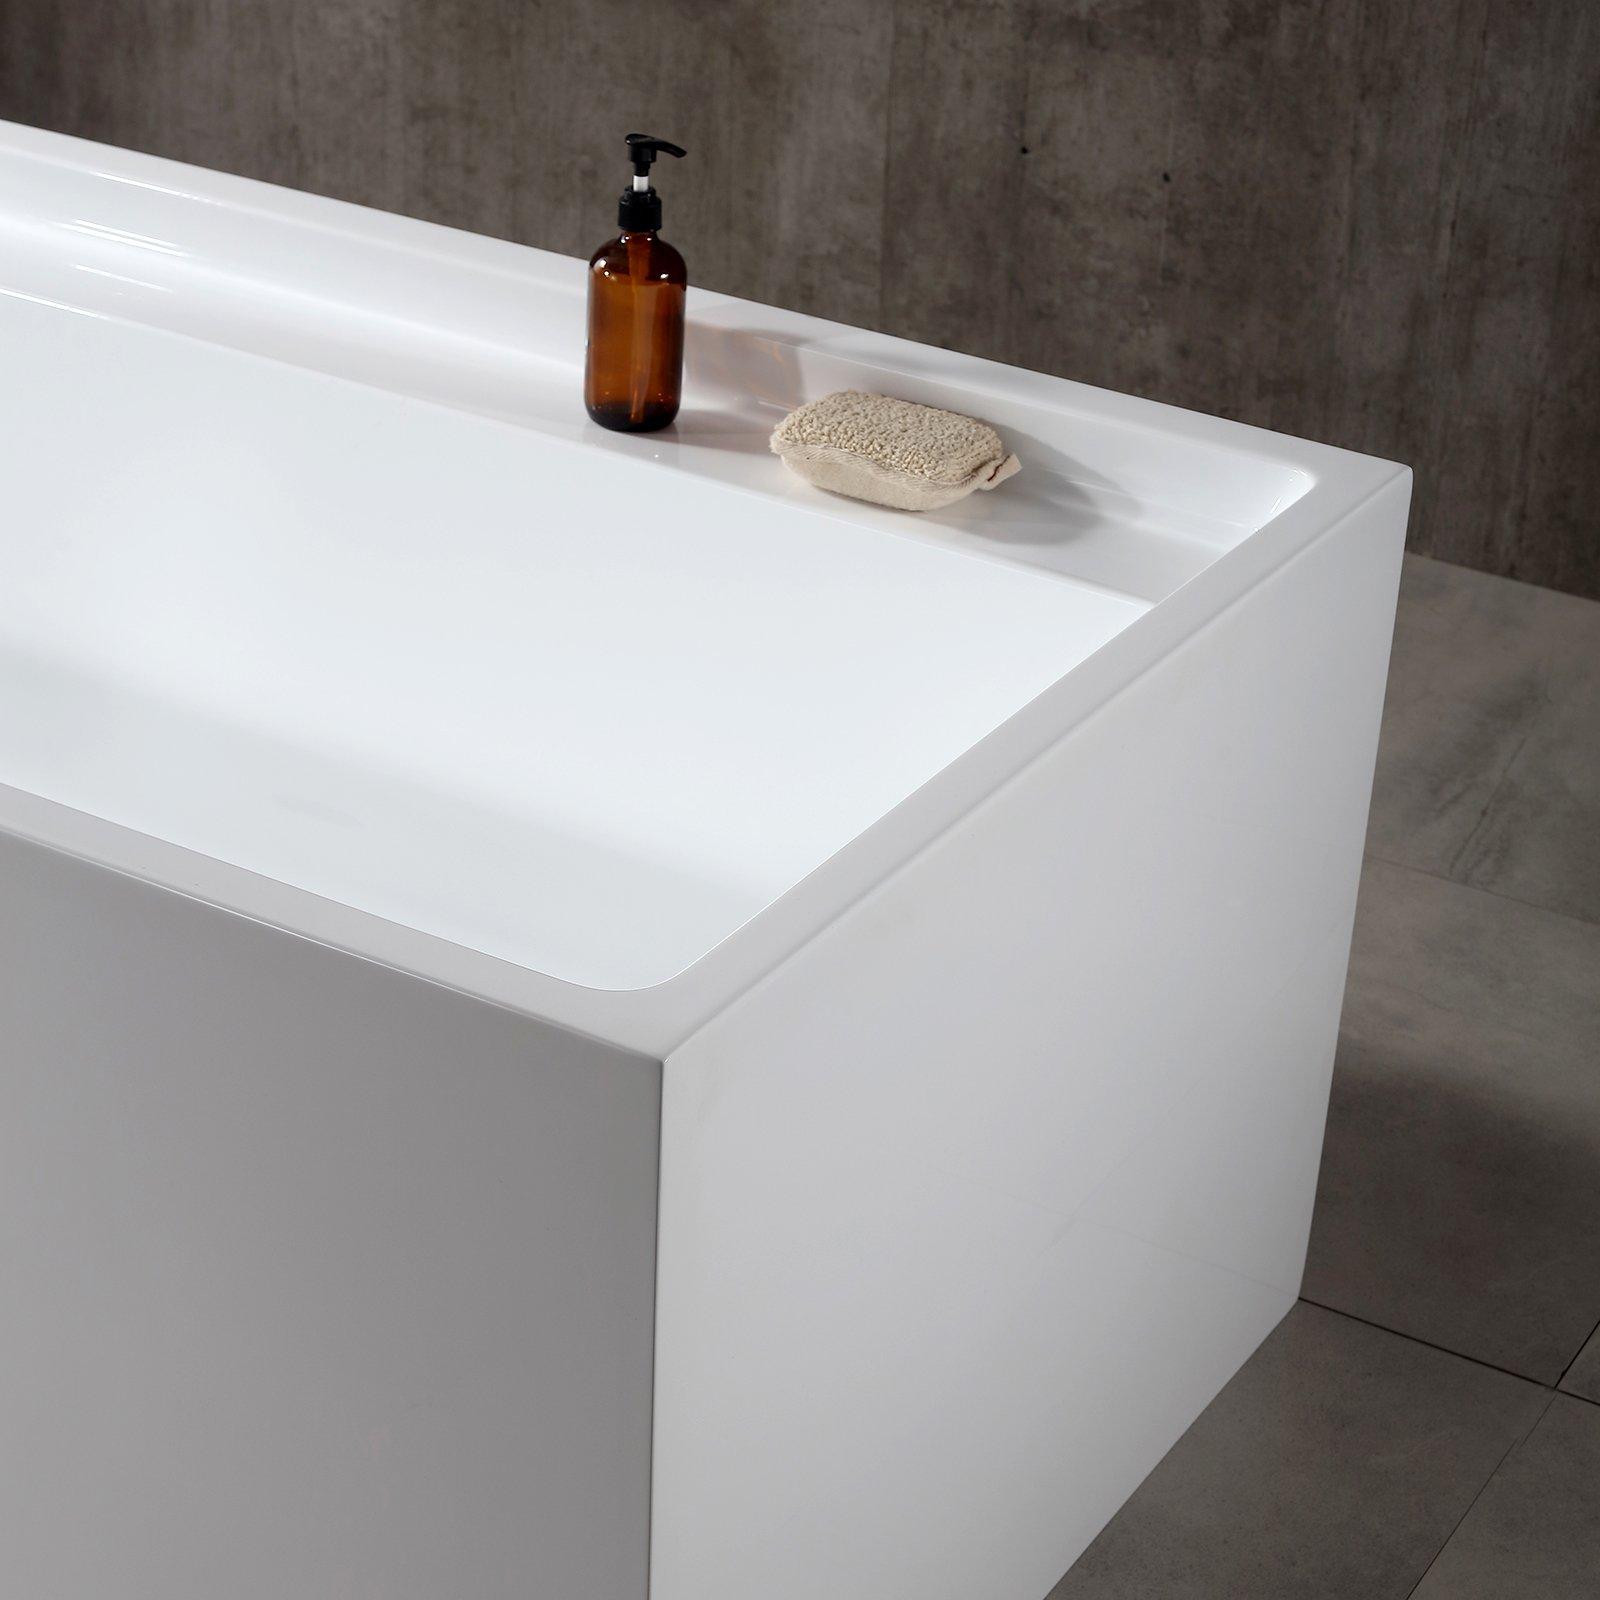 Freistehende Badewanne VERONA Acryl weiß - 170 x 80 x 60 cm - Standarmatur wählbar zoom thumbnail 5